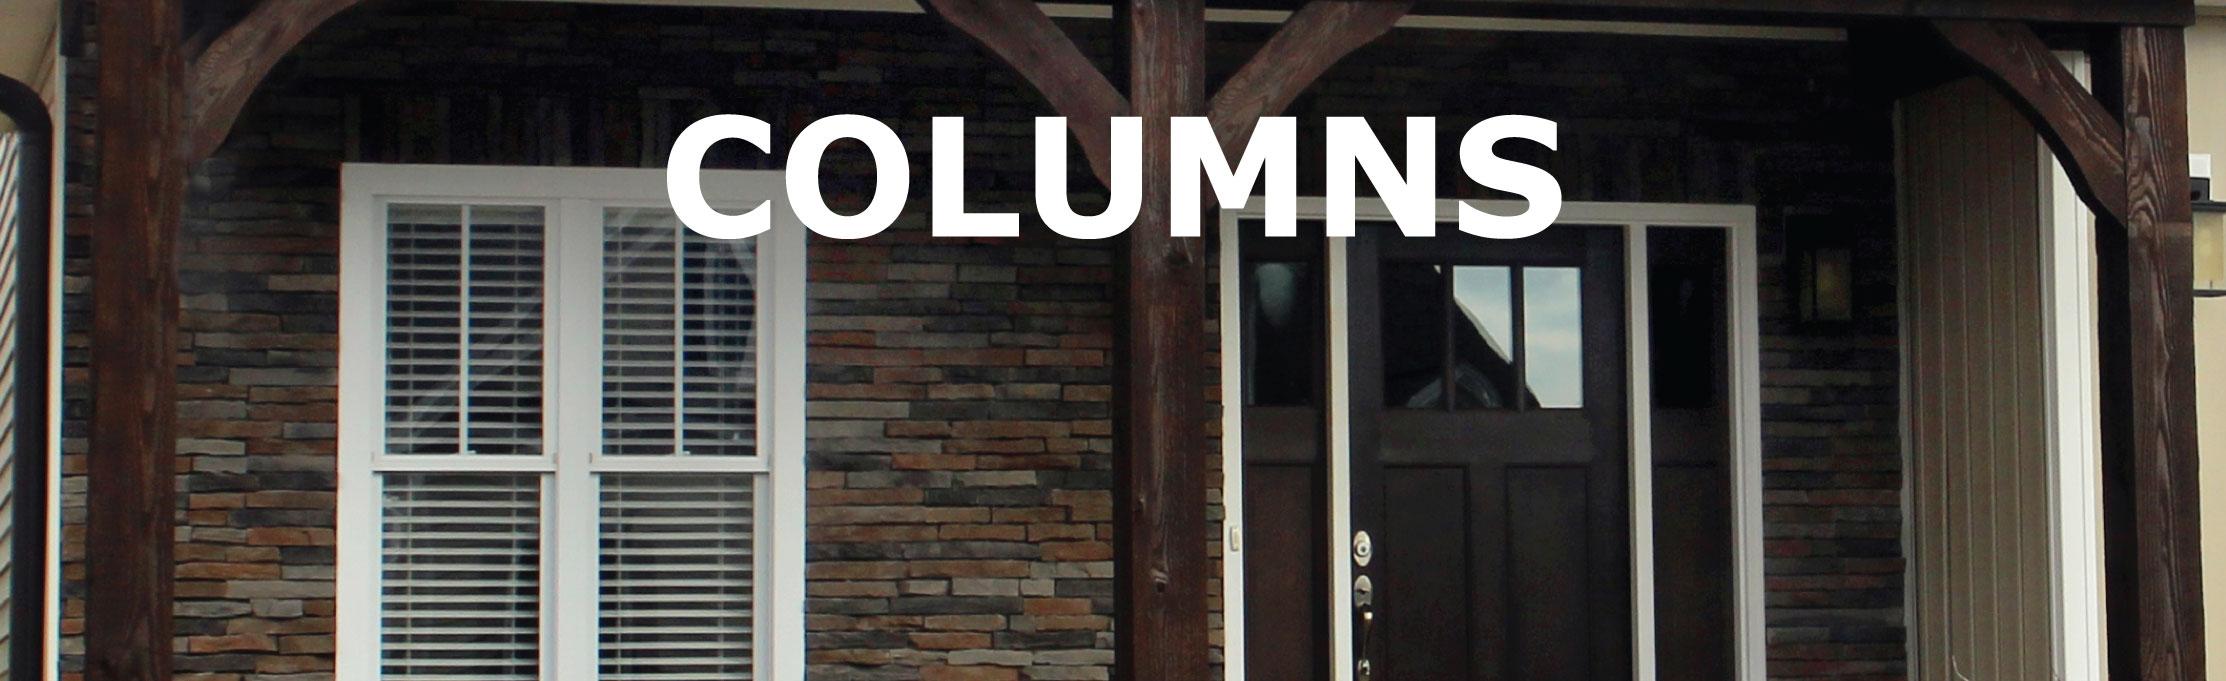 Rails & Columns